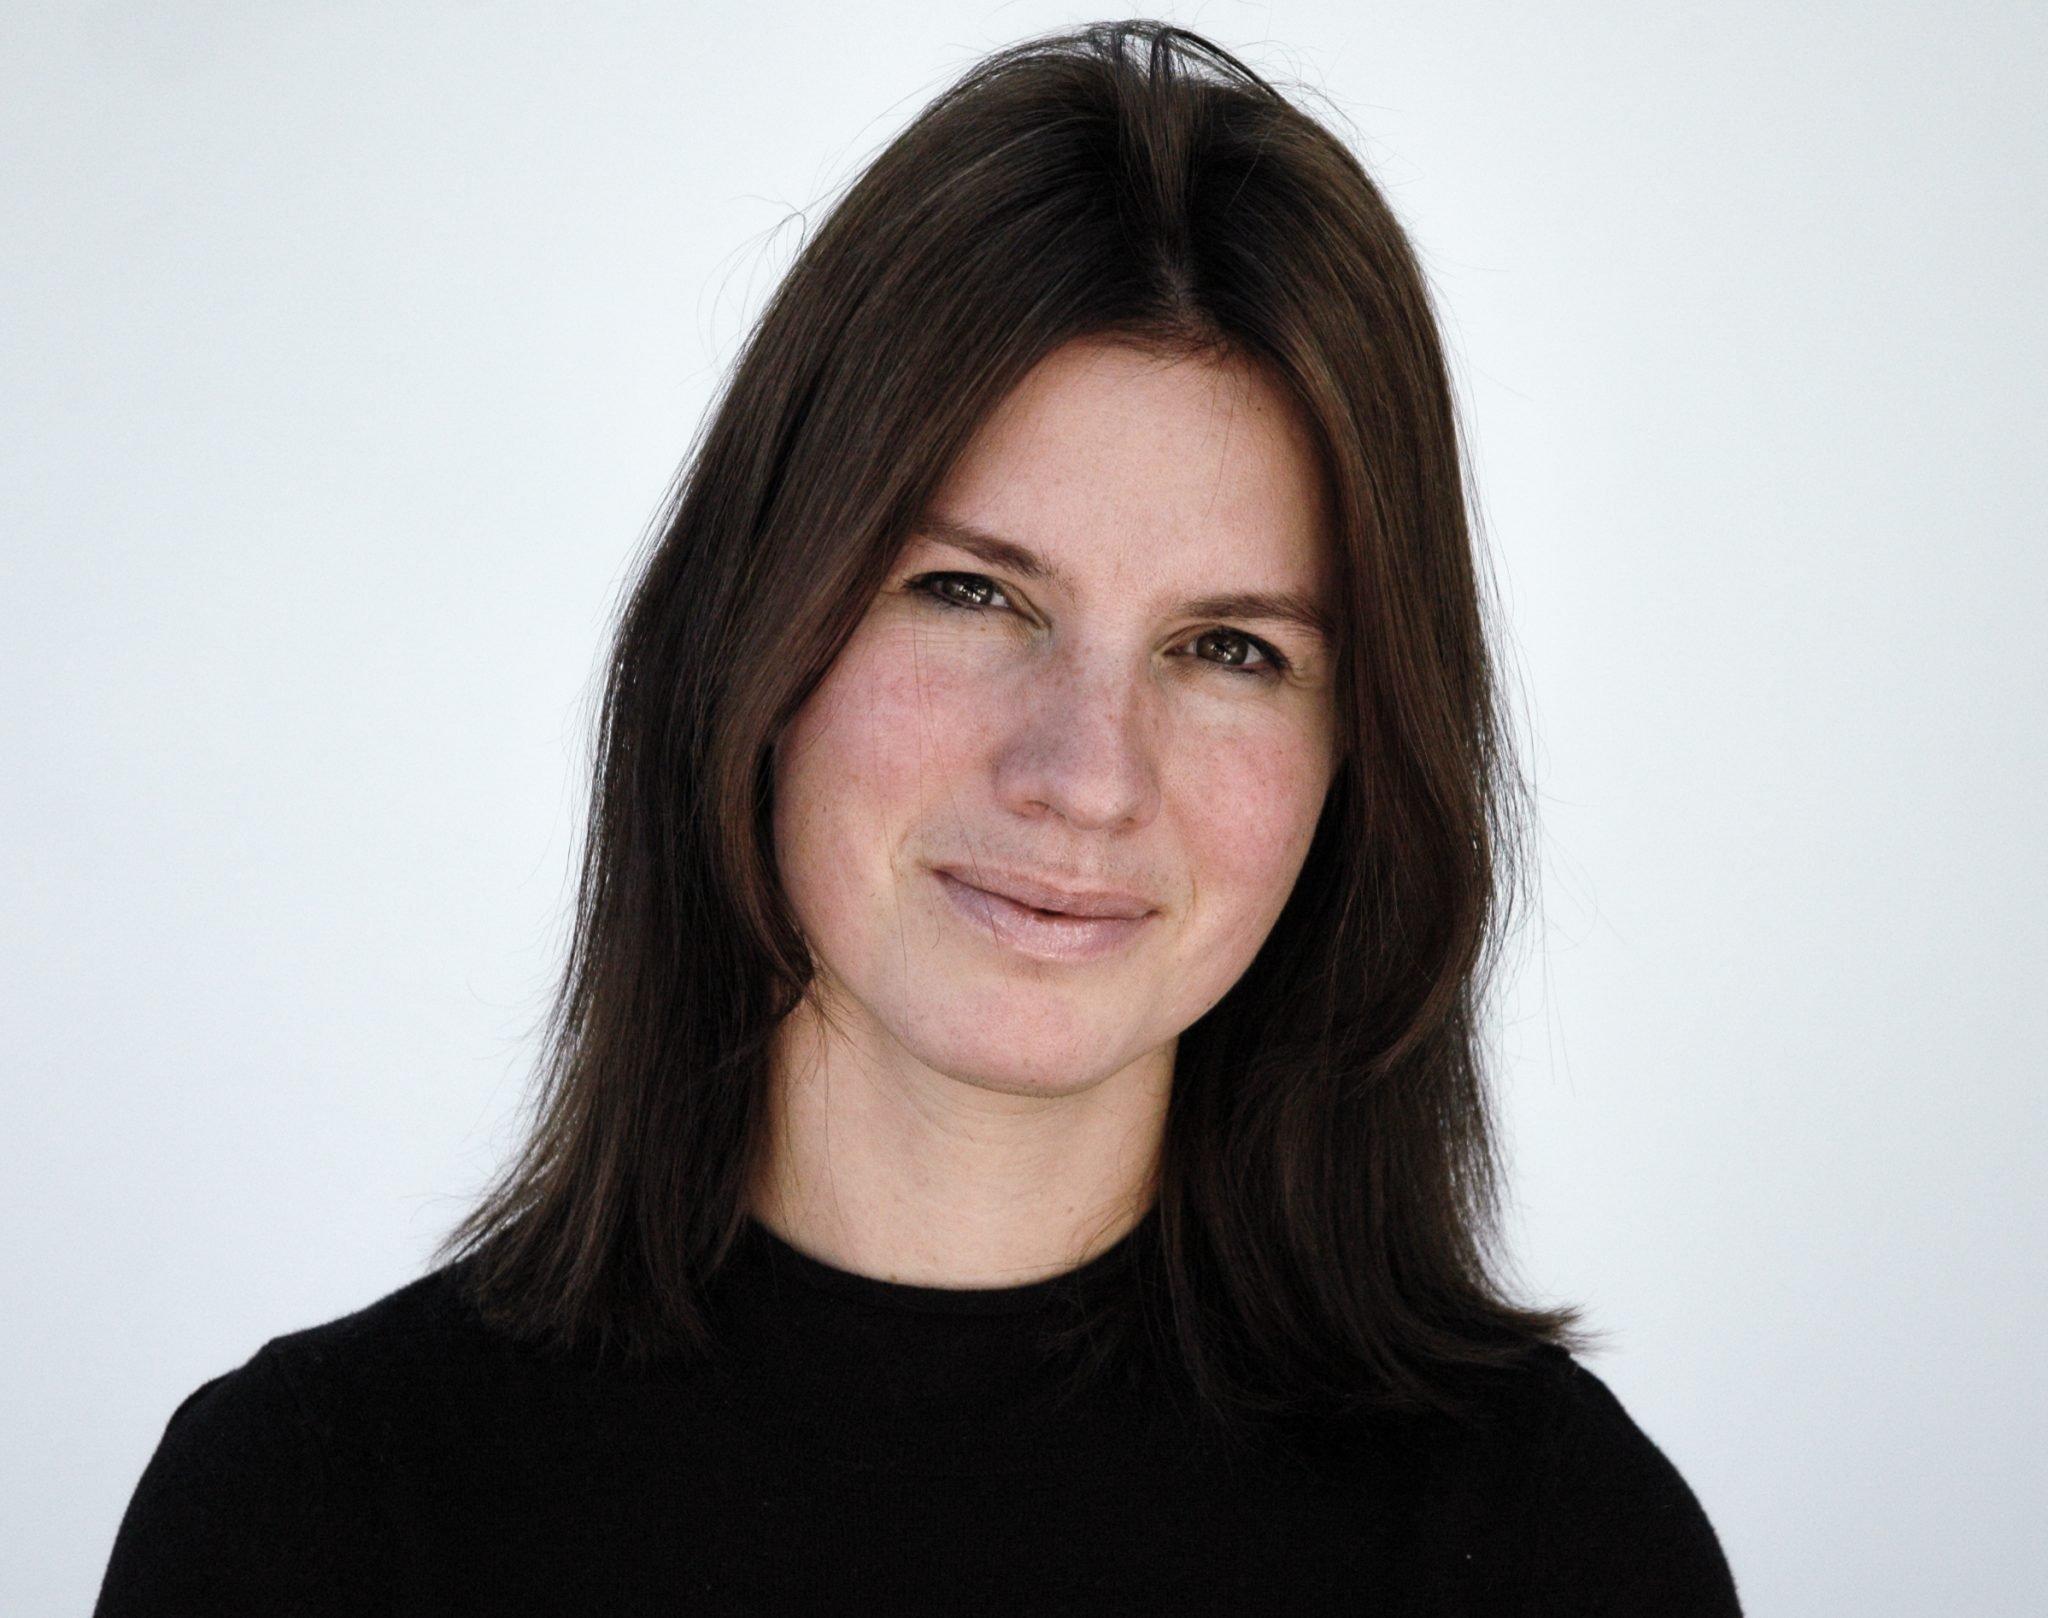 Headshot of film maker and academic Elisabeth Brun